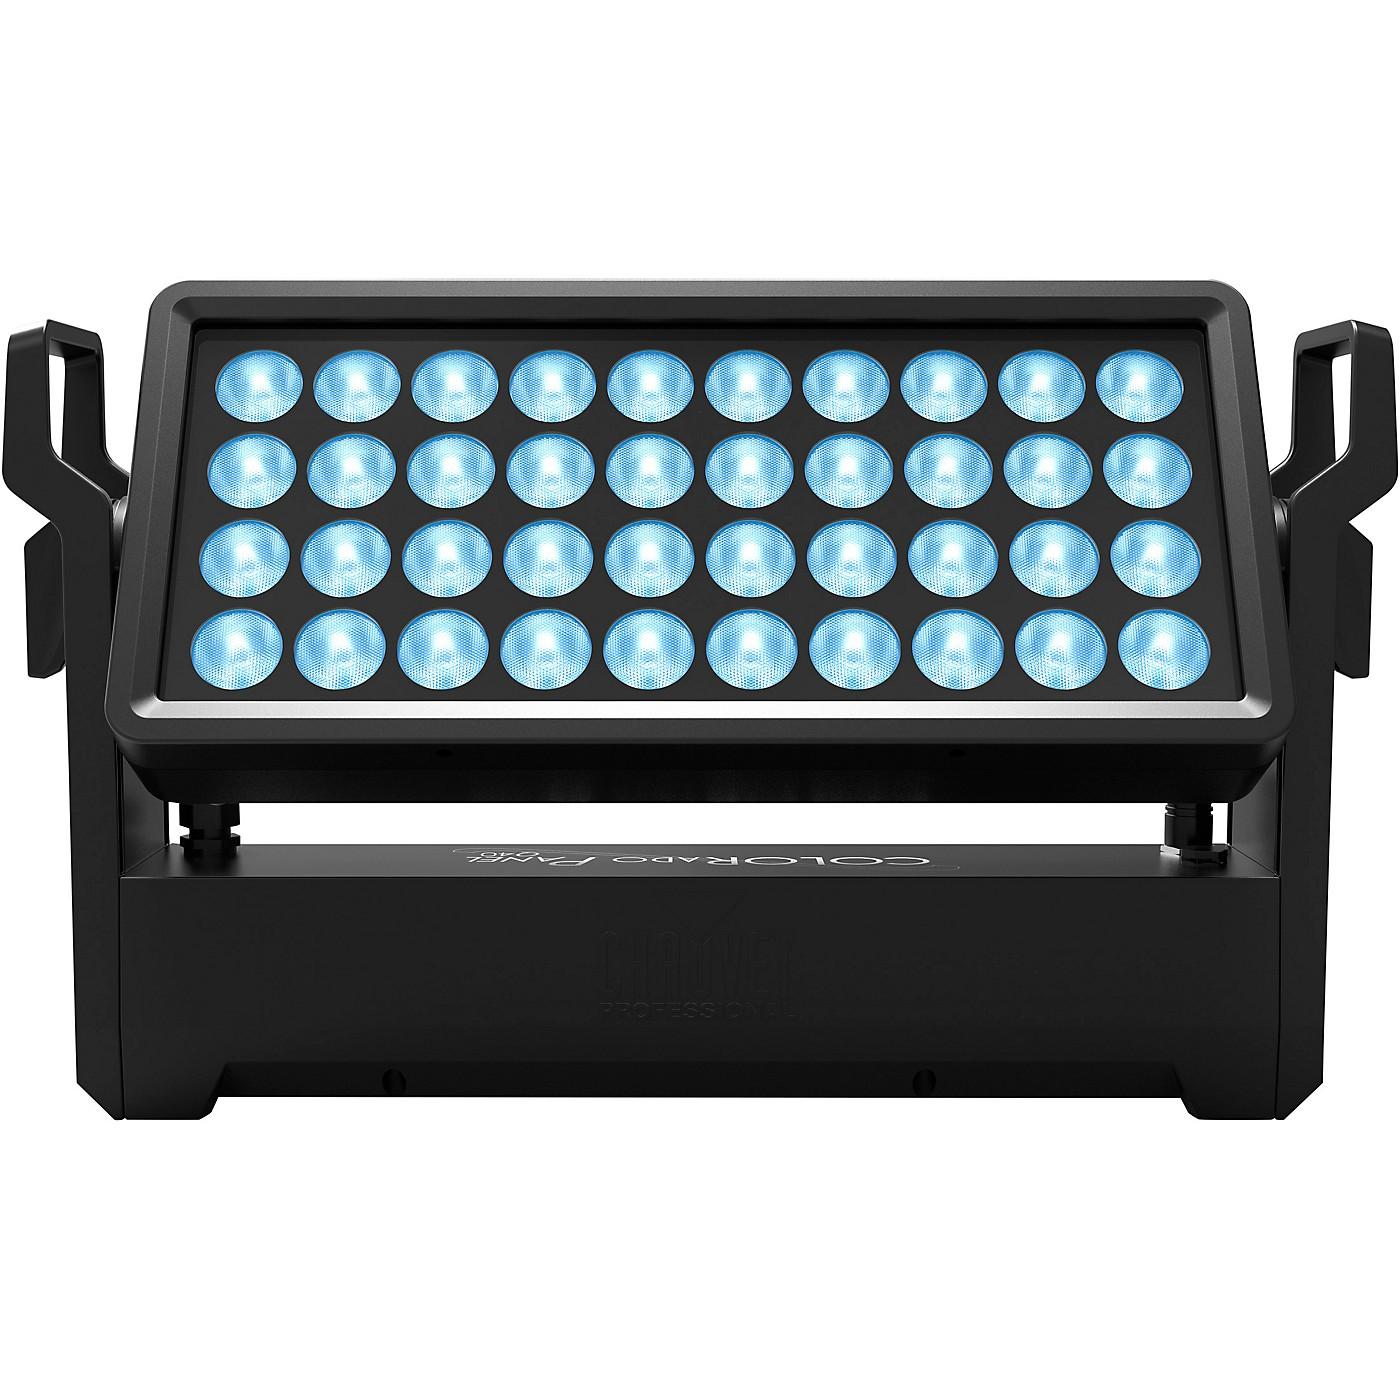 CHAUVET Professional COLORado Panel Q40 RGBW LED thumbnail